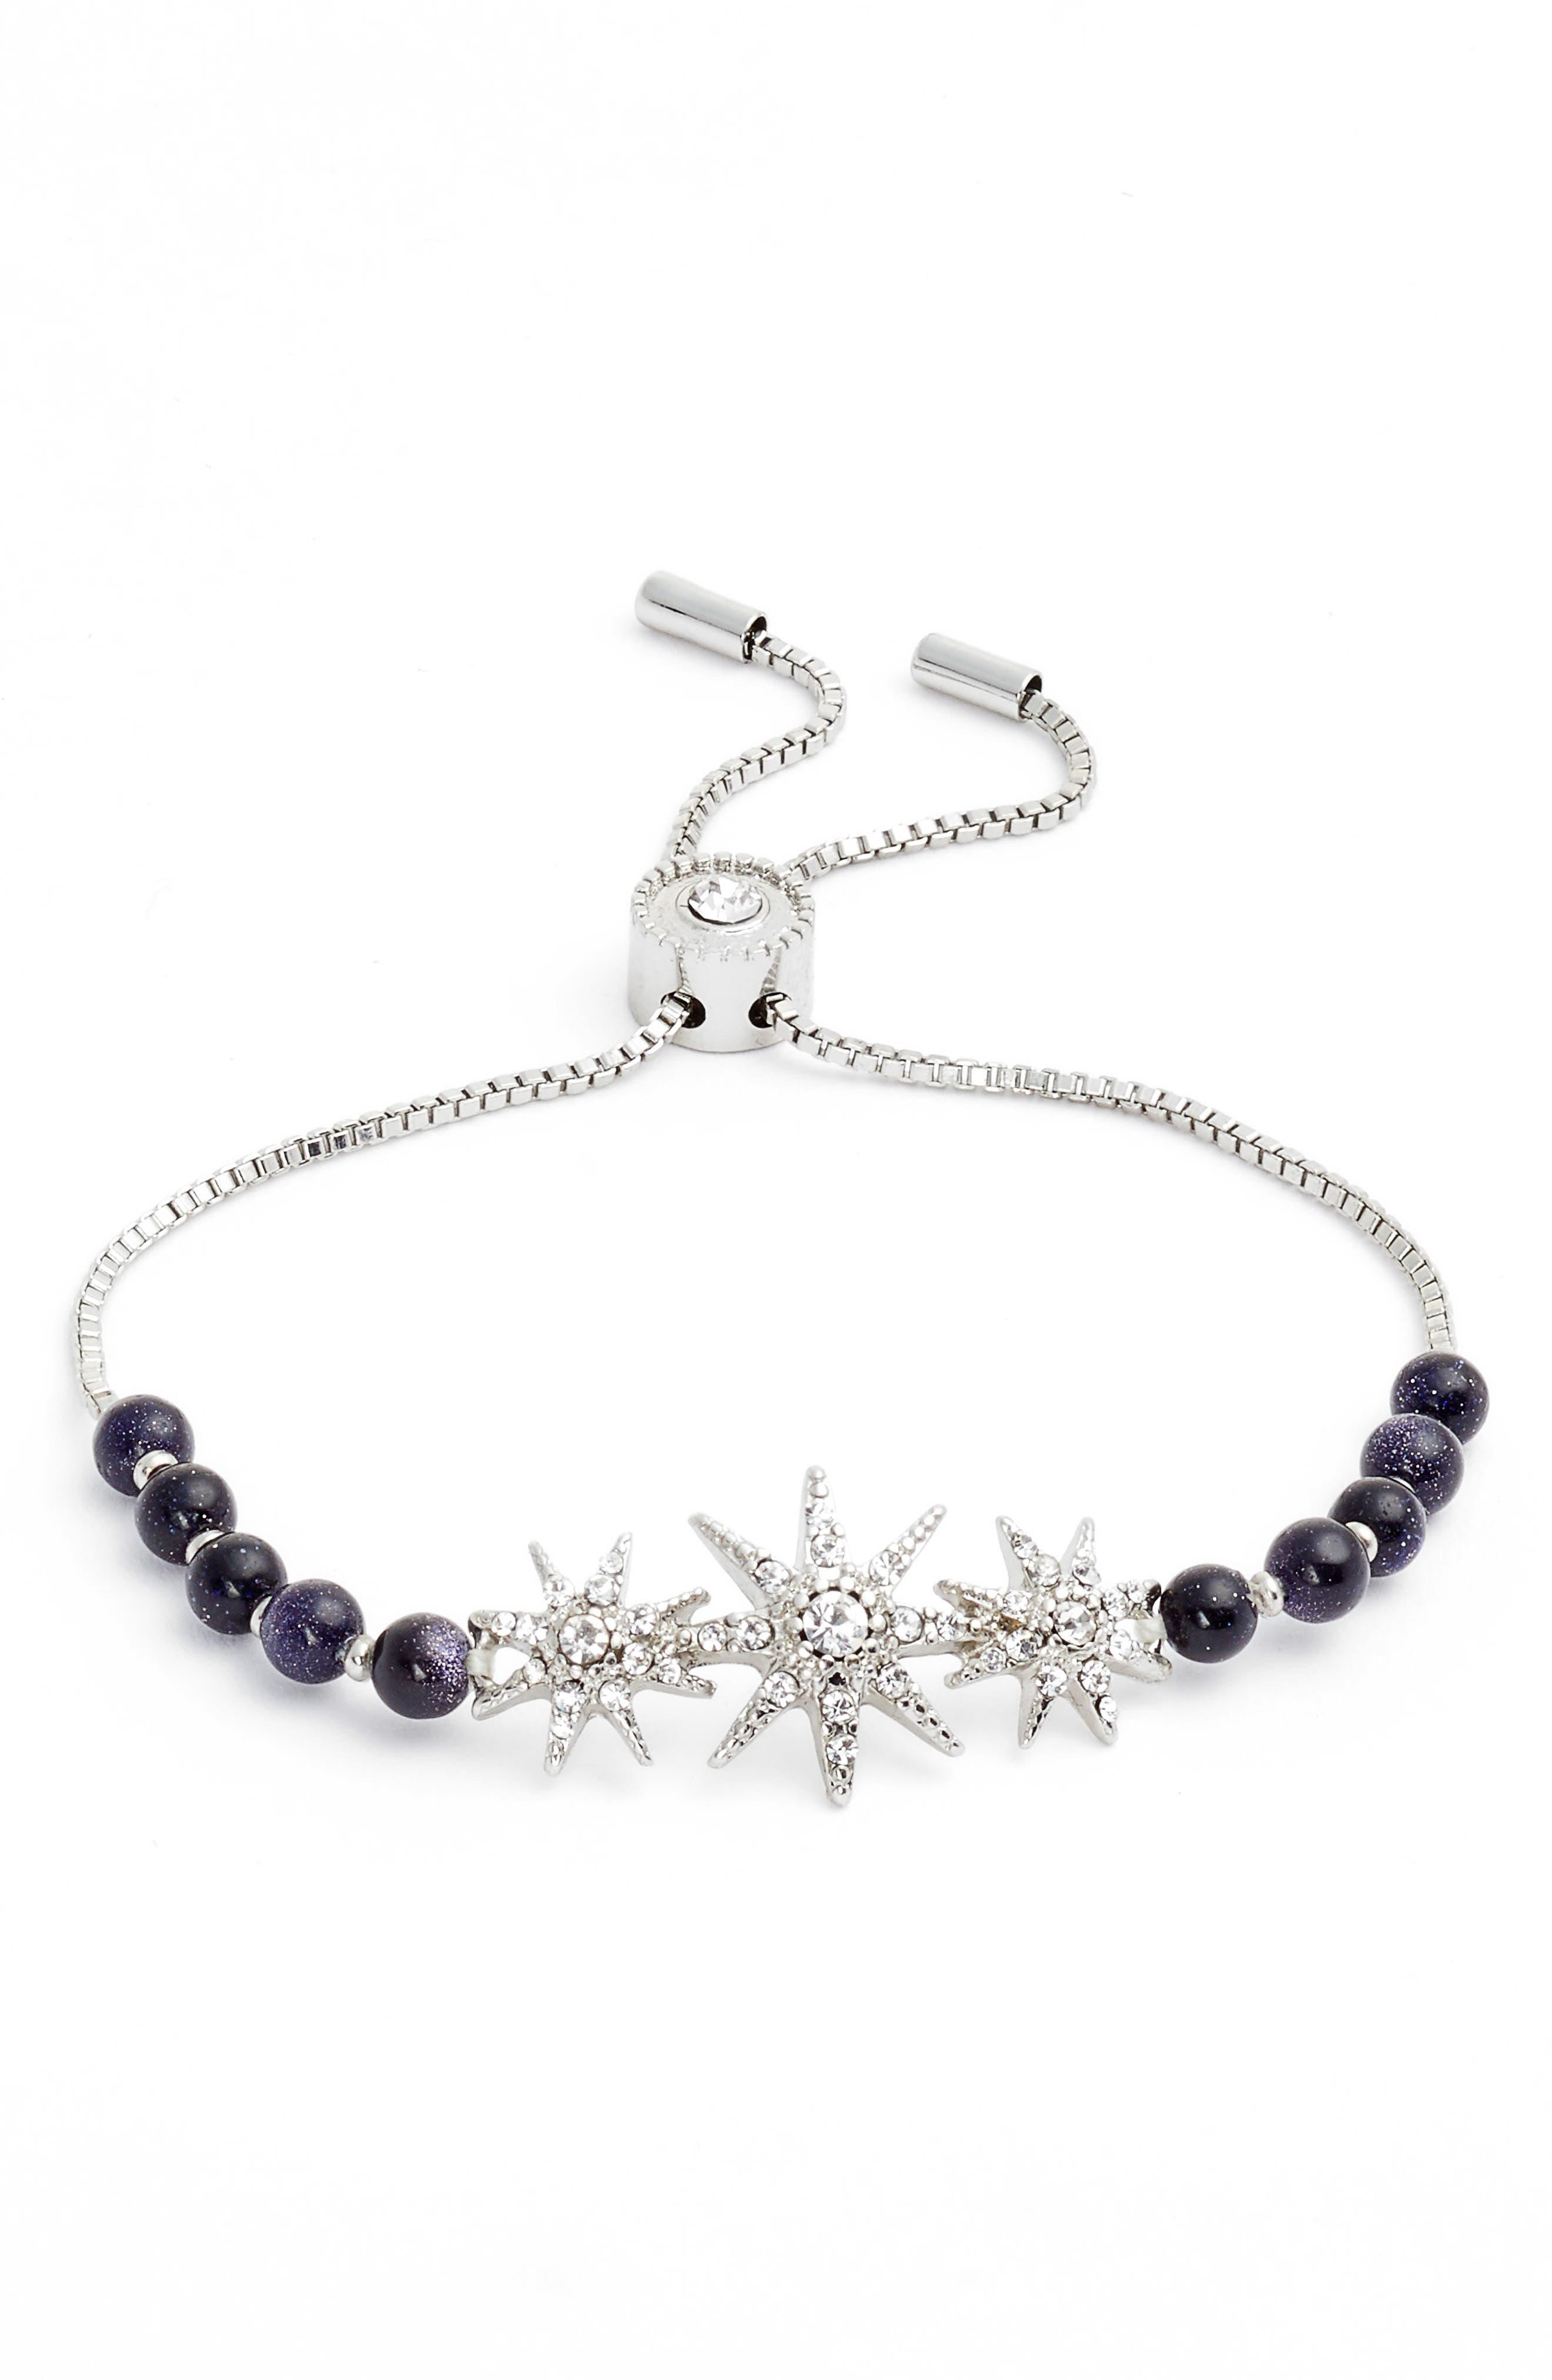 Star Adjustable Bracelet,                             Main thumbnail 1, color,                             040